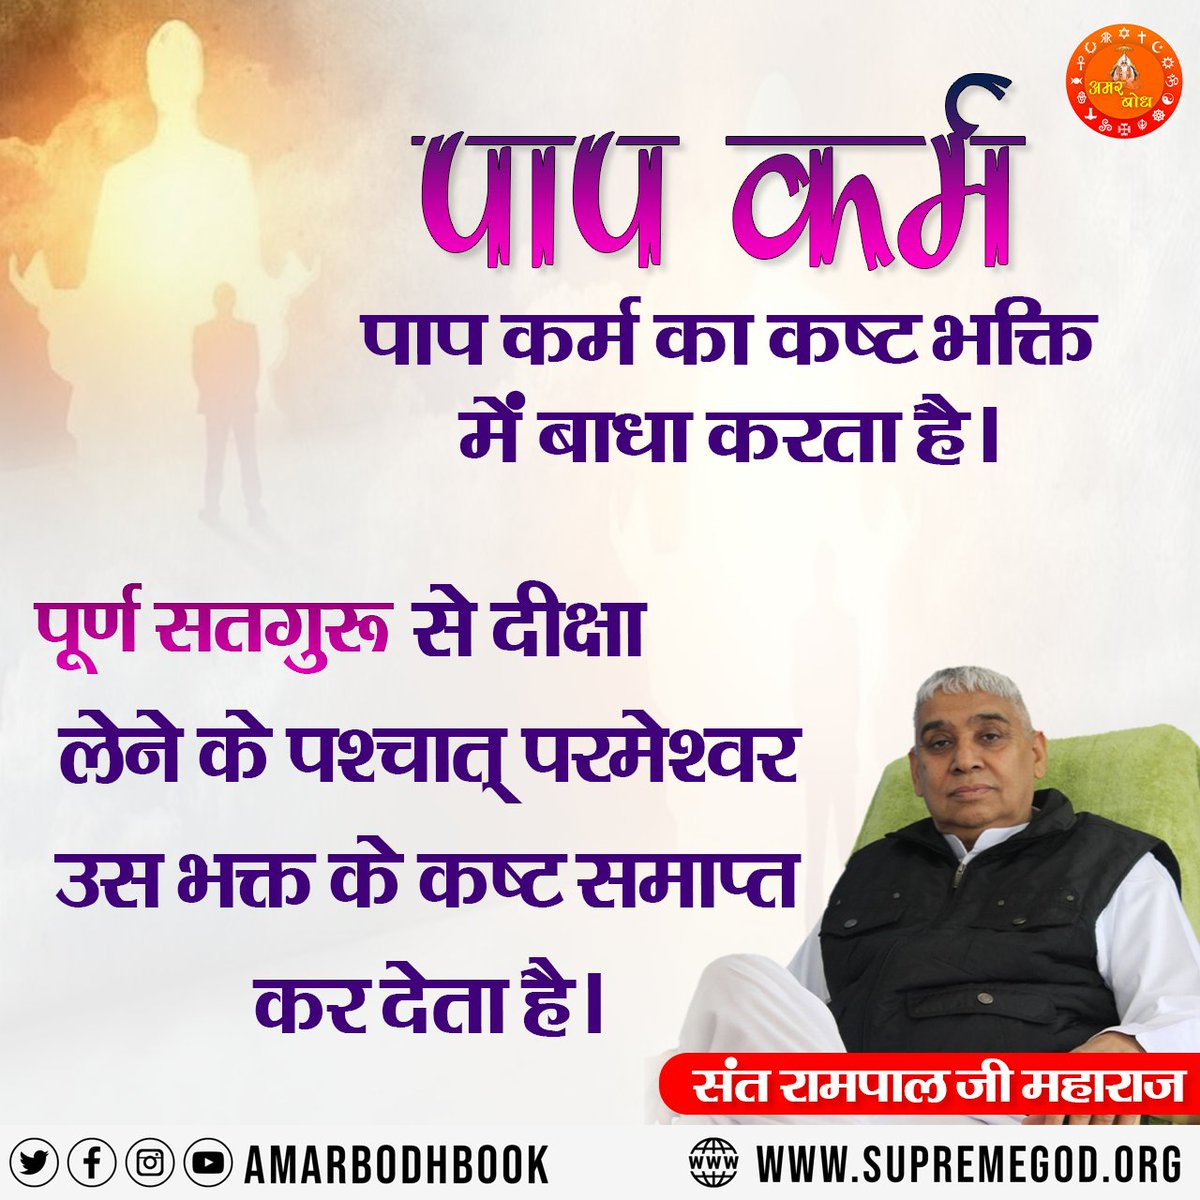 Replying to @AmarBodhBook: #AmarBodh #Quote #Amarwani #AmarBodhBook #Kabir #God #Godiskabir